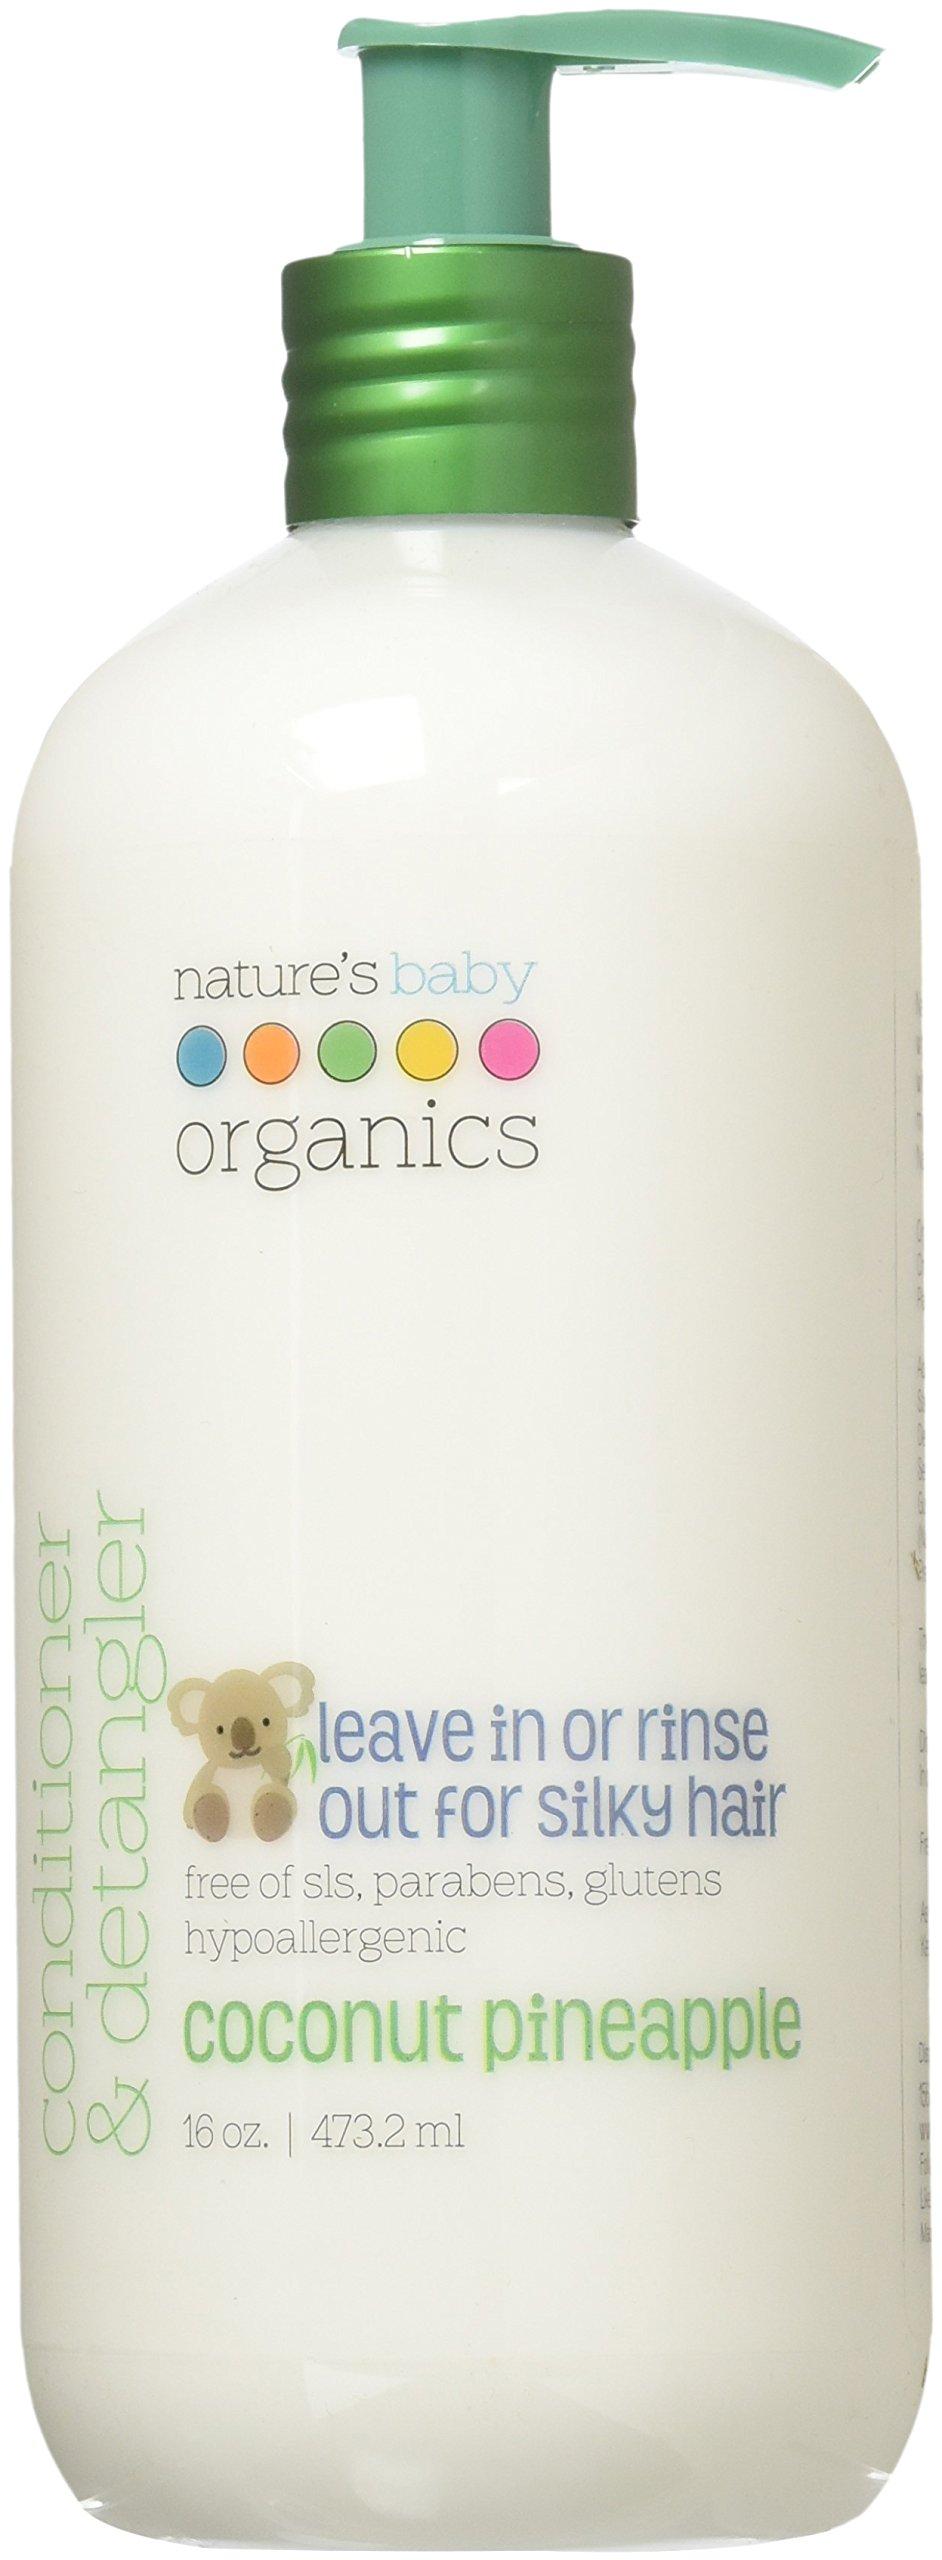 Nature's Baby Organics Conditioner & Detangler, Coconut Pineapple, 16 oz | Babies, Kids, Adults! Moisturizing, Gentle, Rich, Hypoallergenic | No Parabens, SLS, Glutens